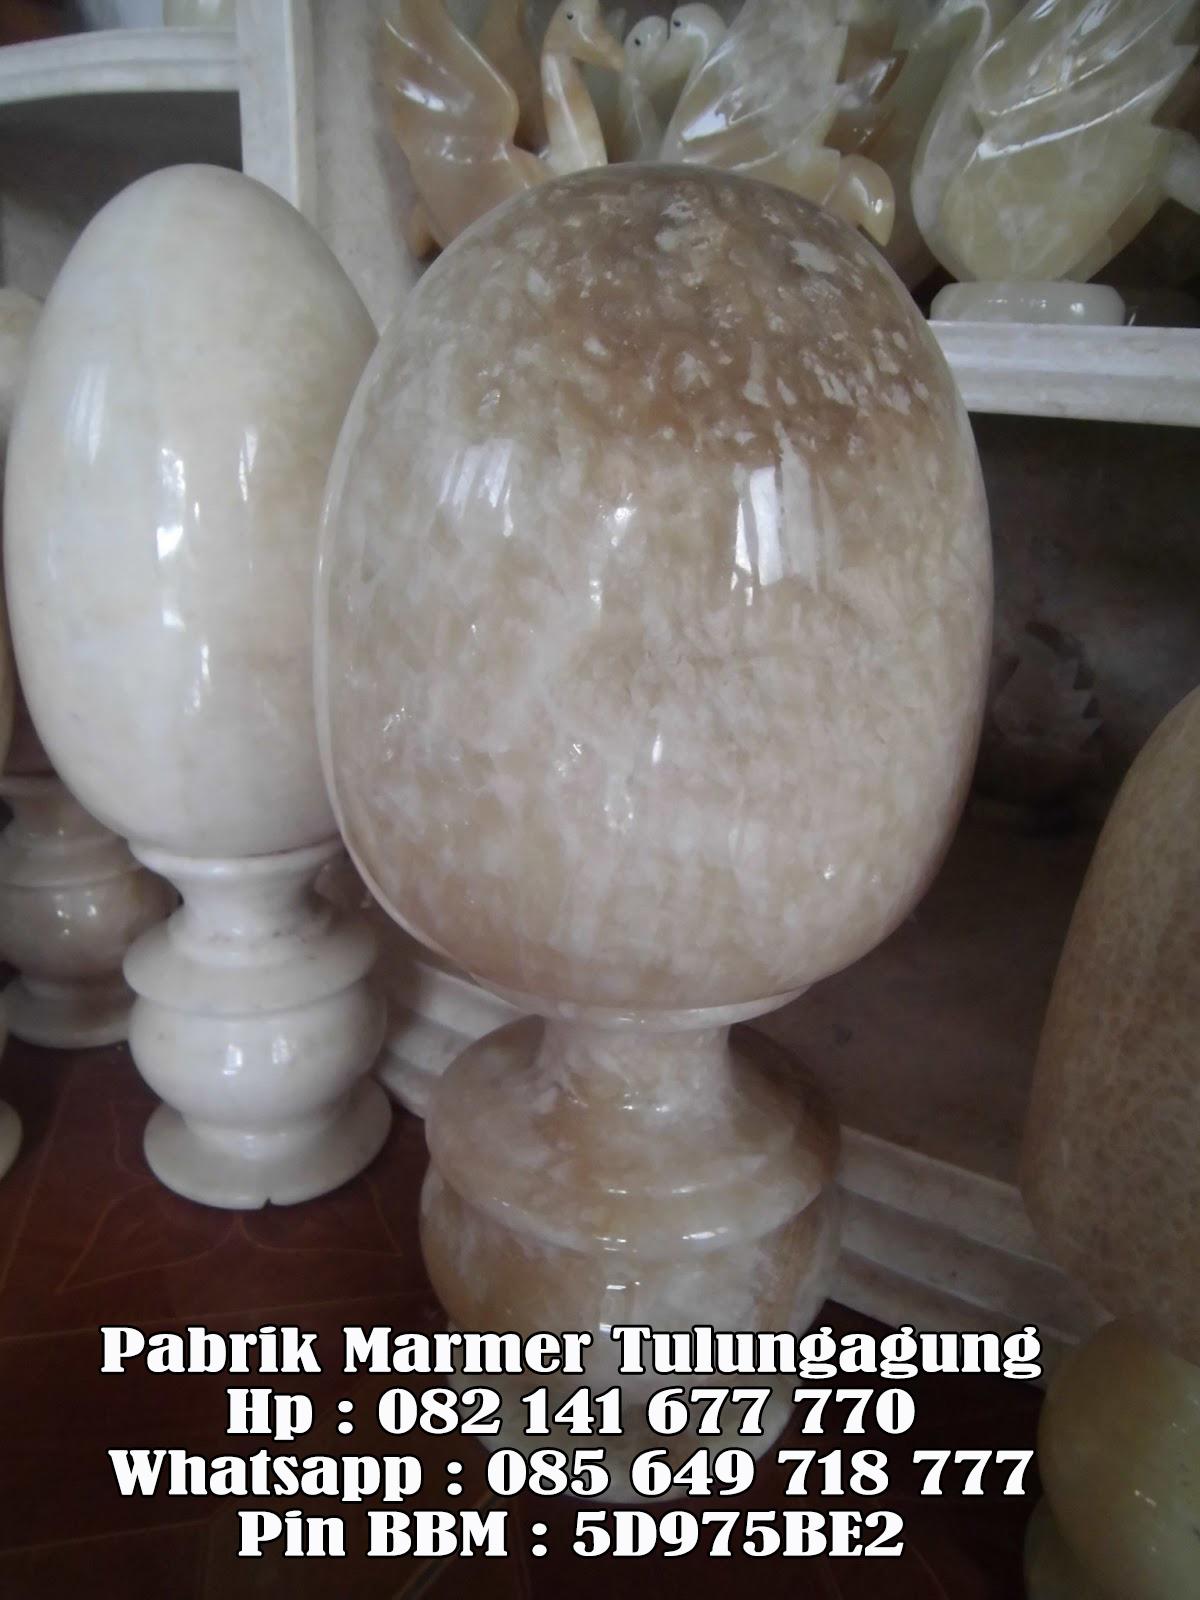 Kap Lampu Marmer   Jual Kap Lampu Onix – Pabrik Marmer Tulungagung